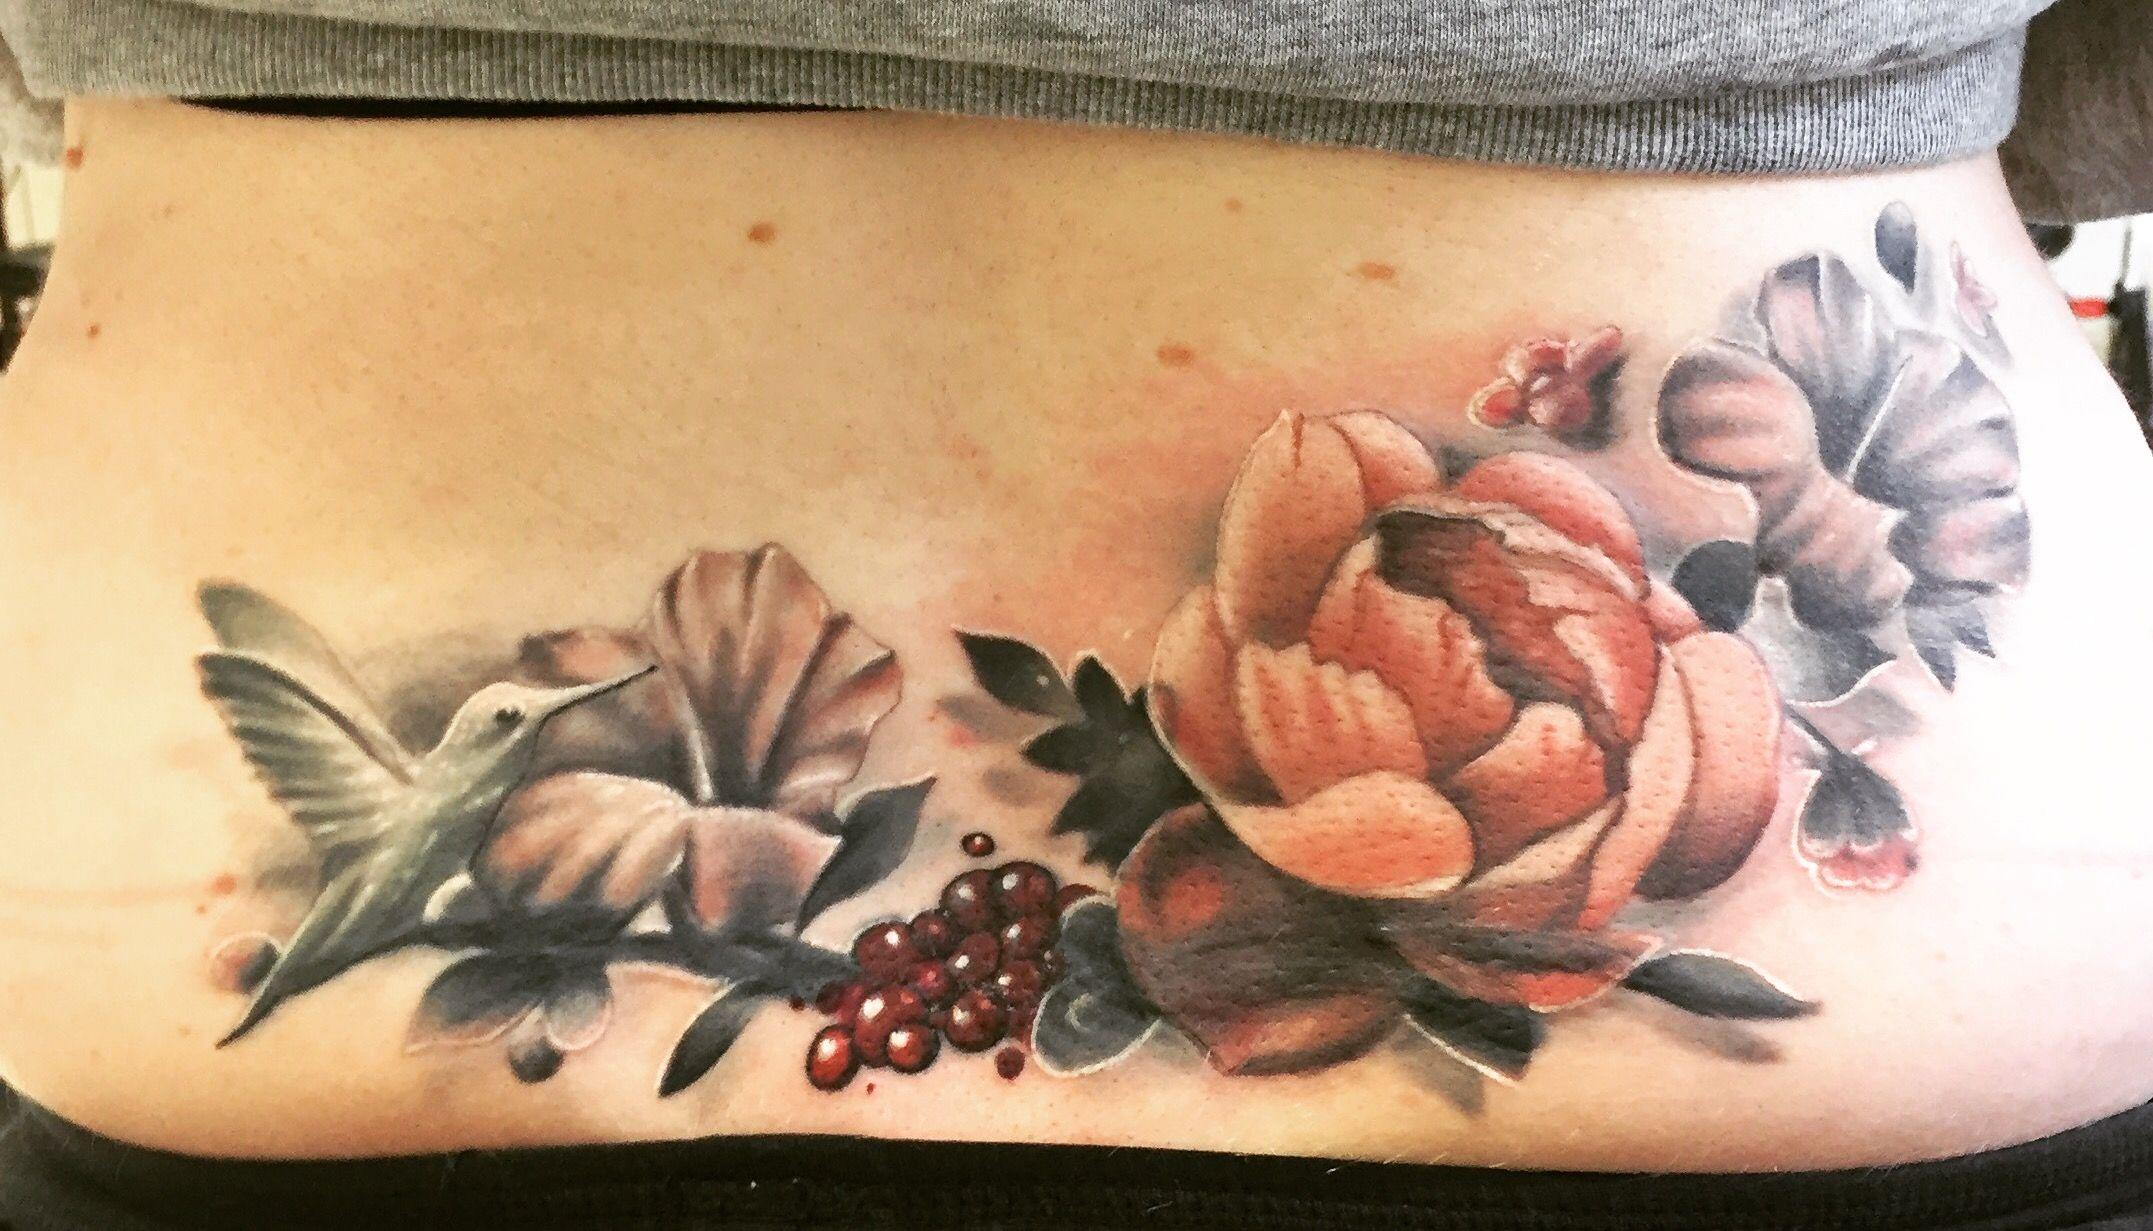 My New Tattoo Vintage Flower Bird Lower Back Coverup Lower Back Tattoos Back Tattoos Back Tattoo